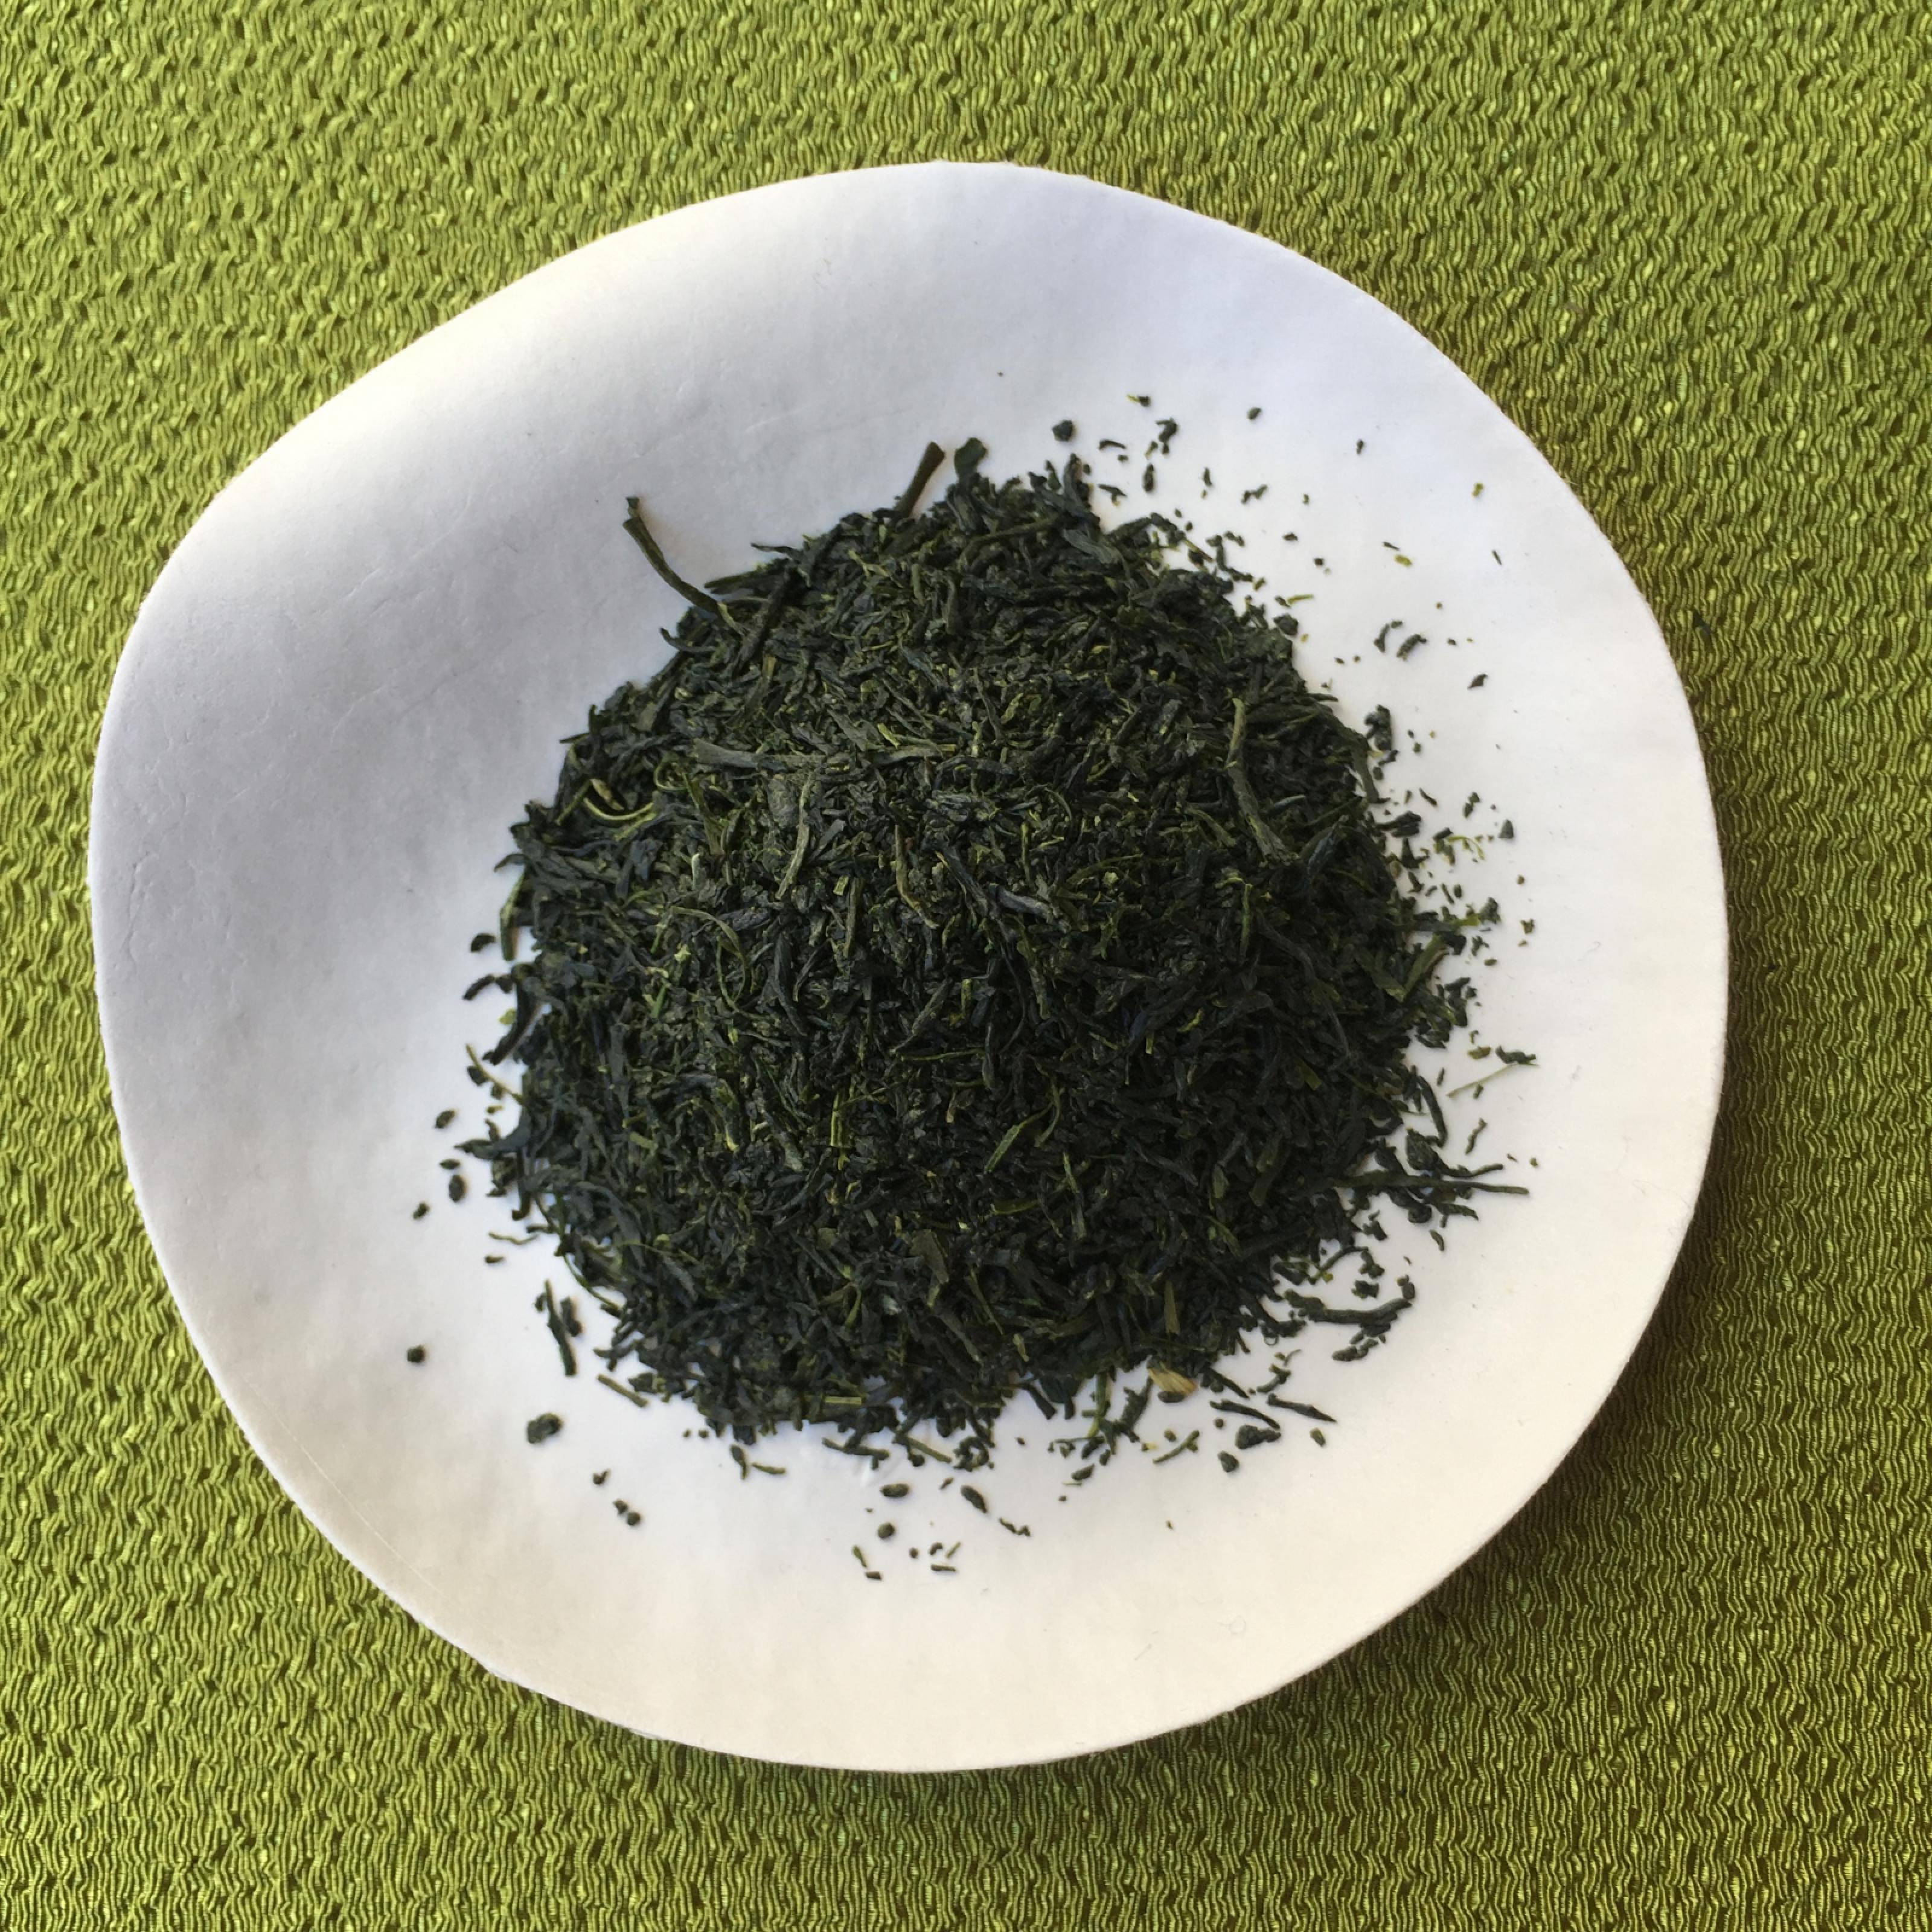 Tamaryokucha de Sonogi - thé vert japonais - Nihoncha Paris